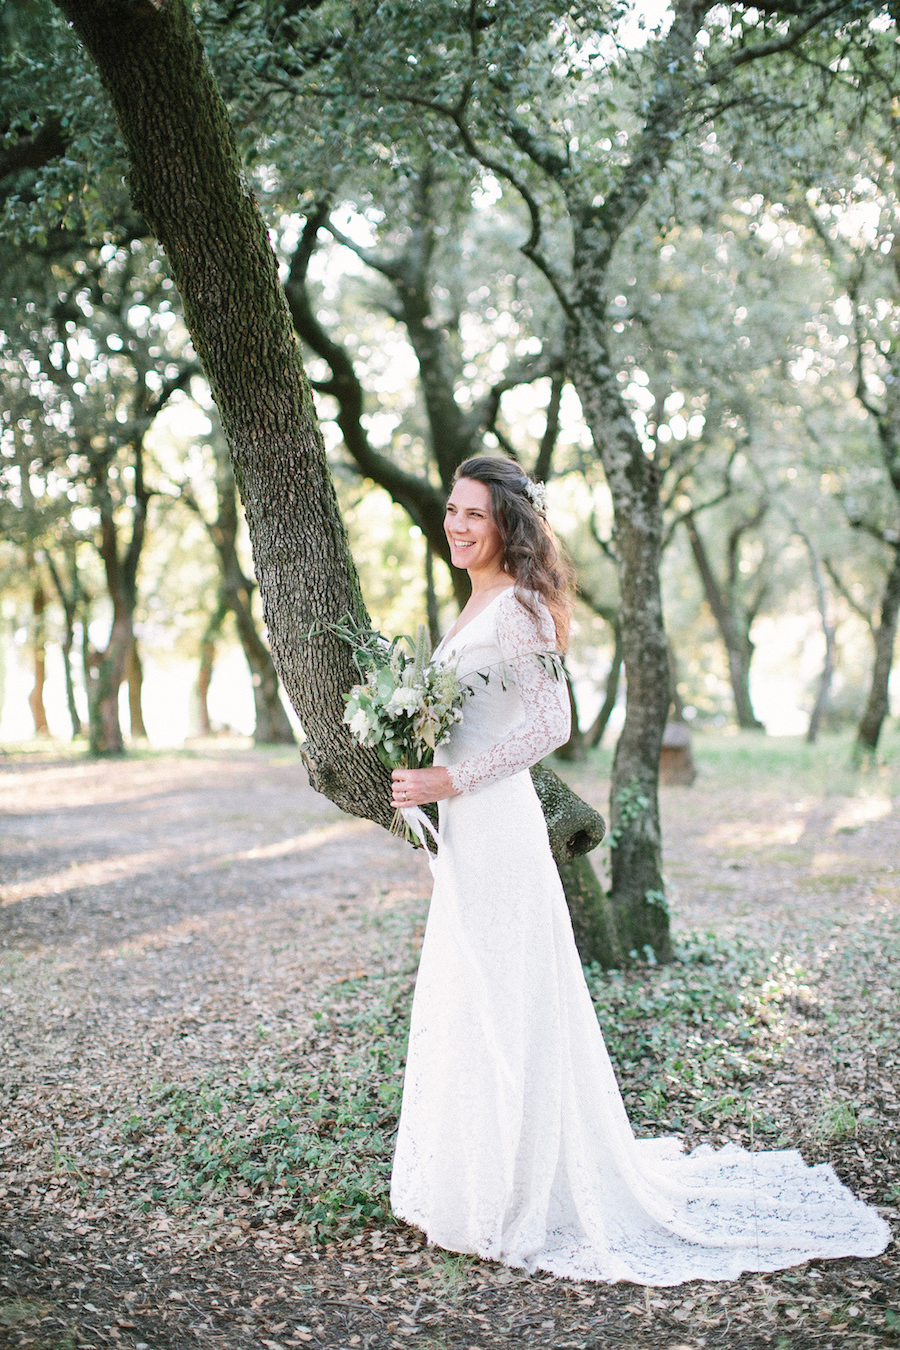 saya-photography-rustic-french-wedding-provence-domaines-de-patras-96.jpg